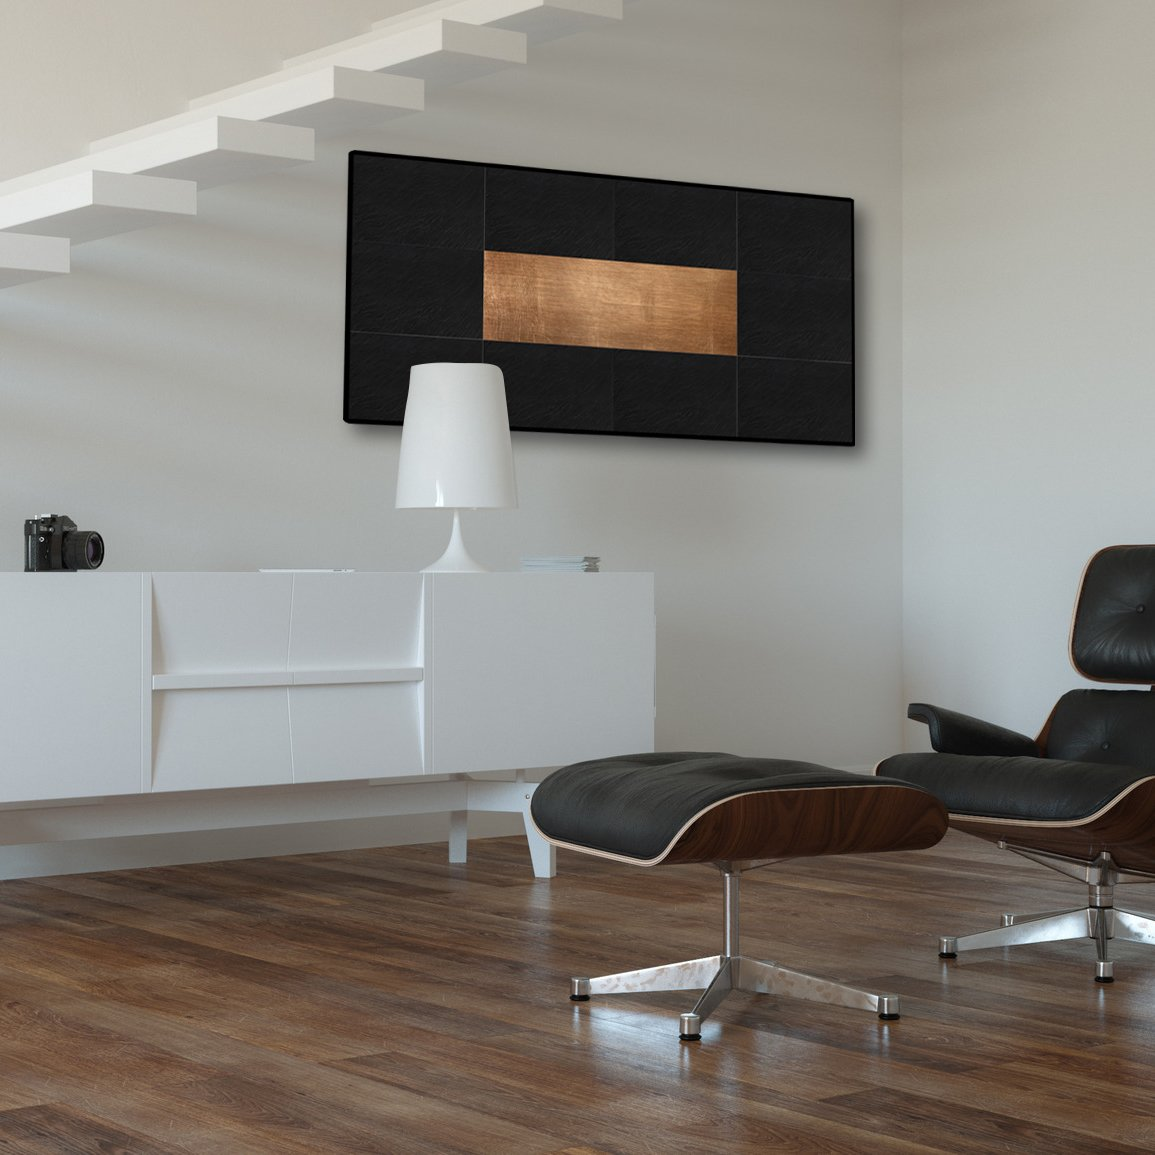 pannelli radianti arredo thermosaic simple 160x60 PLUS LUXURY